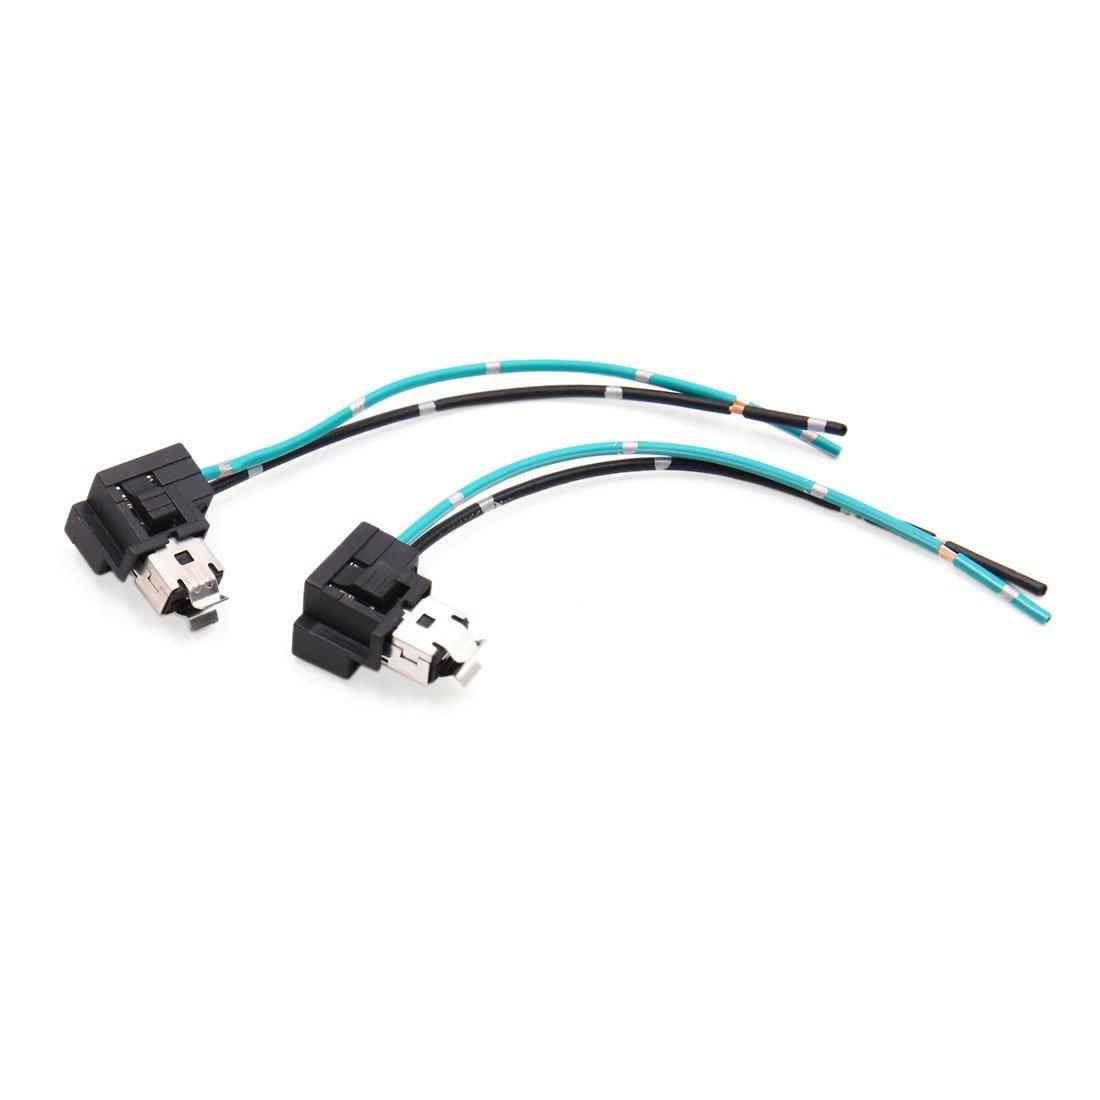 uxcell 2pcs h1 headlight fog lamp extension wiring harness